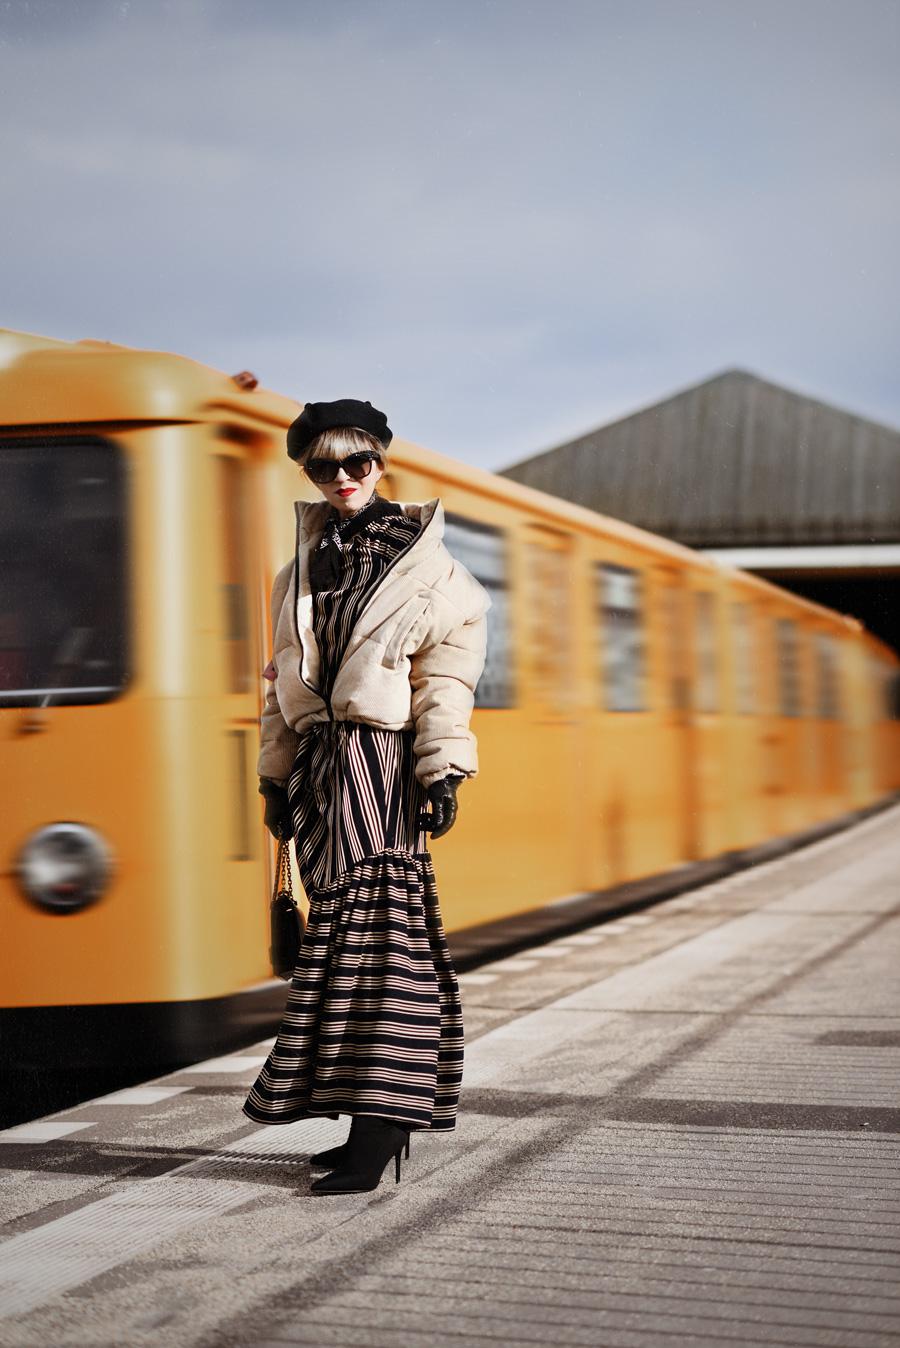 asos, white, dress, midi, kleid, dior, fashionblogger, berlin, modeblogger, streetstyle, metro, deconstructed, trend, move, fotografie, streifen, ootd